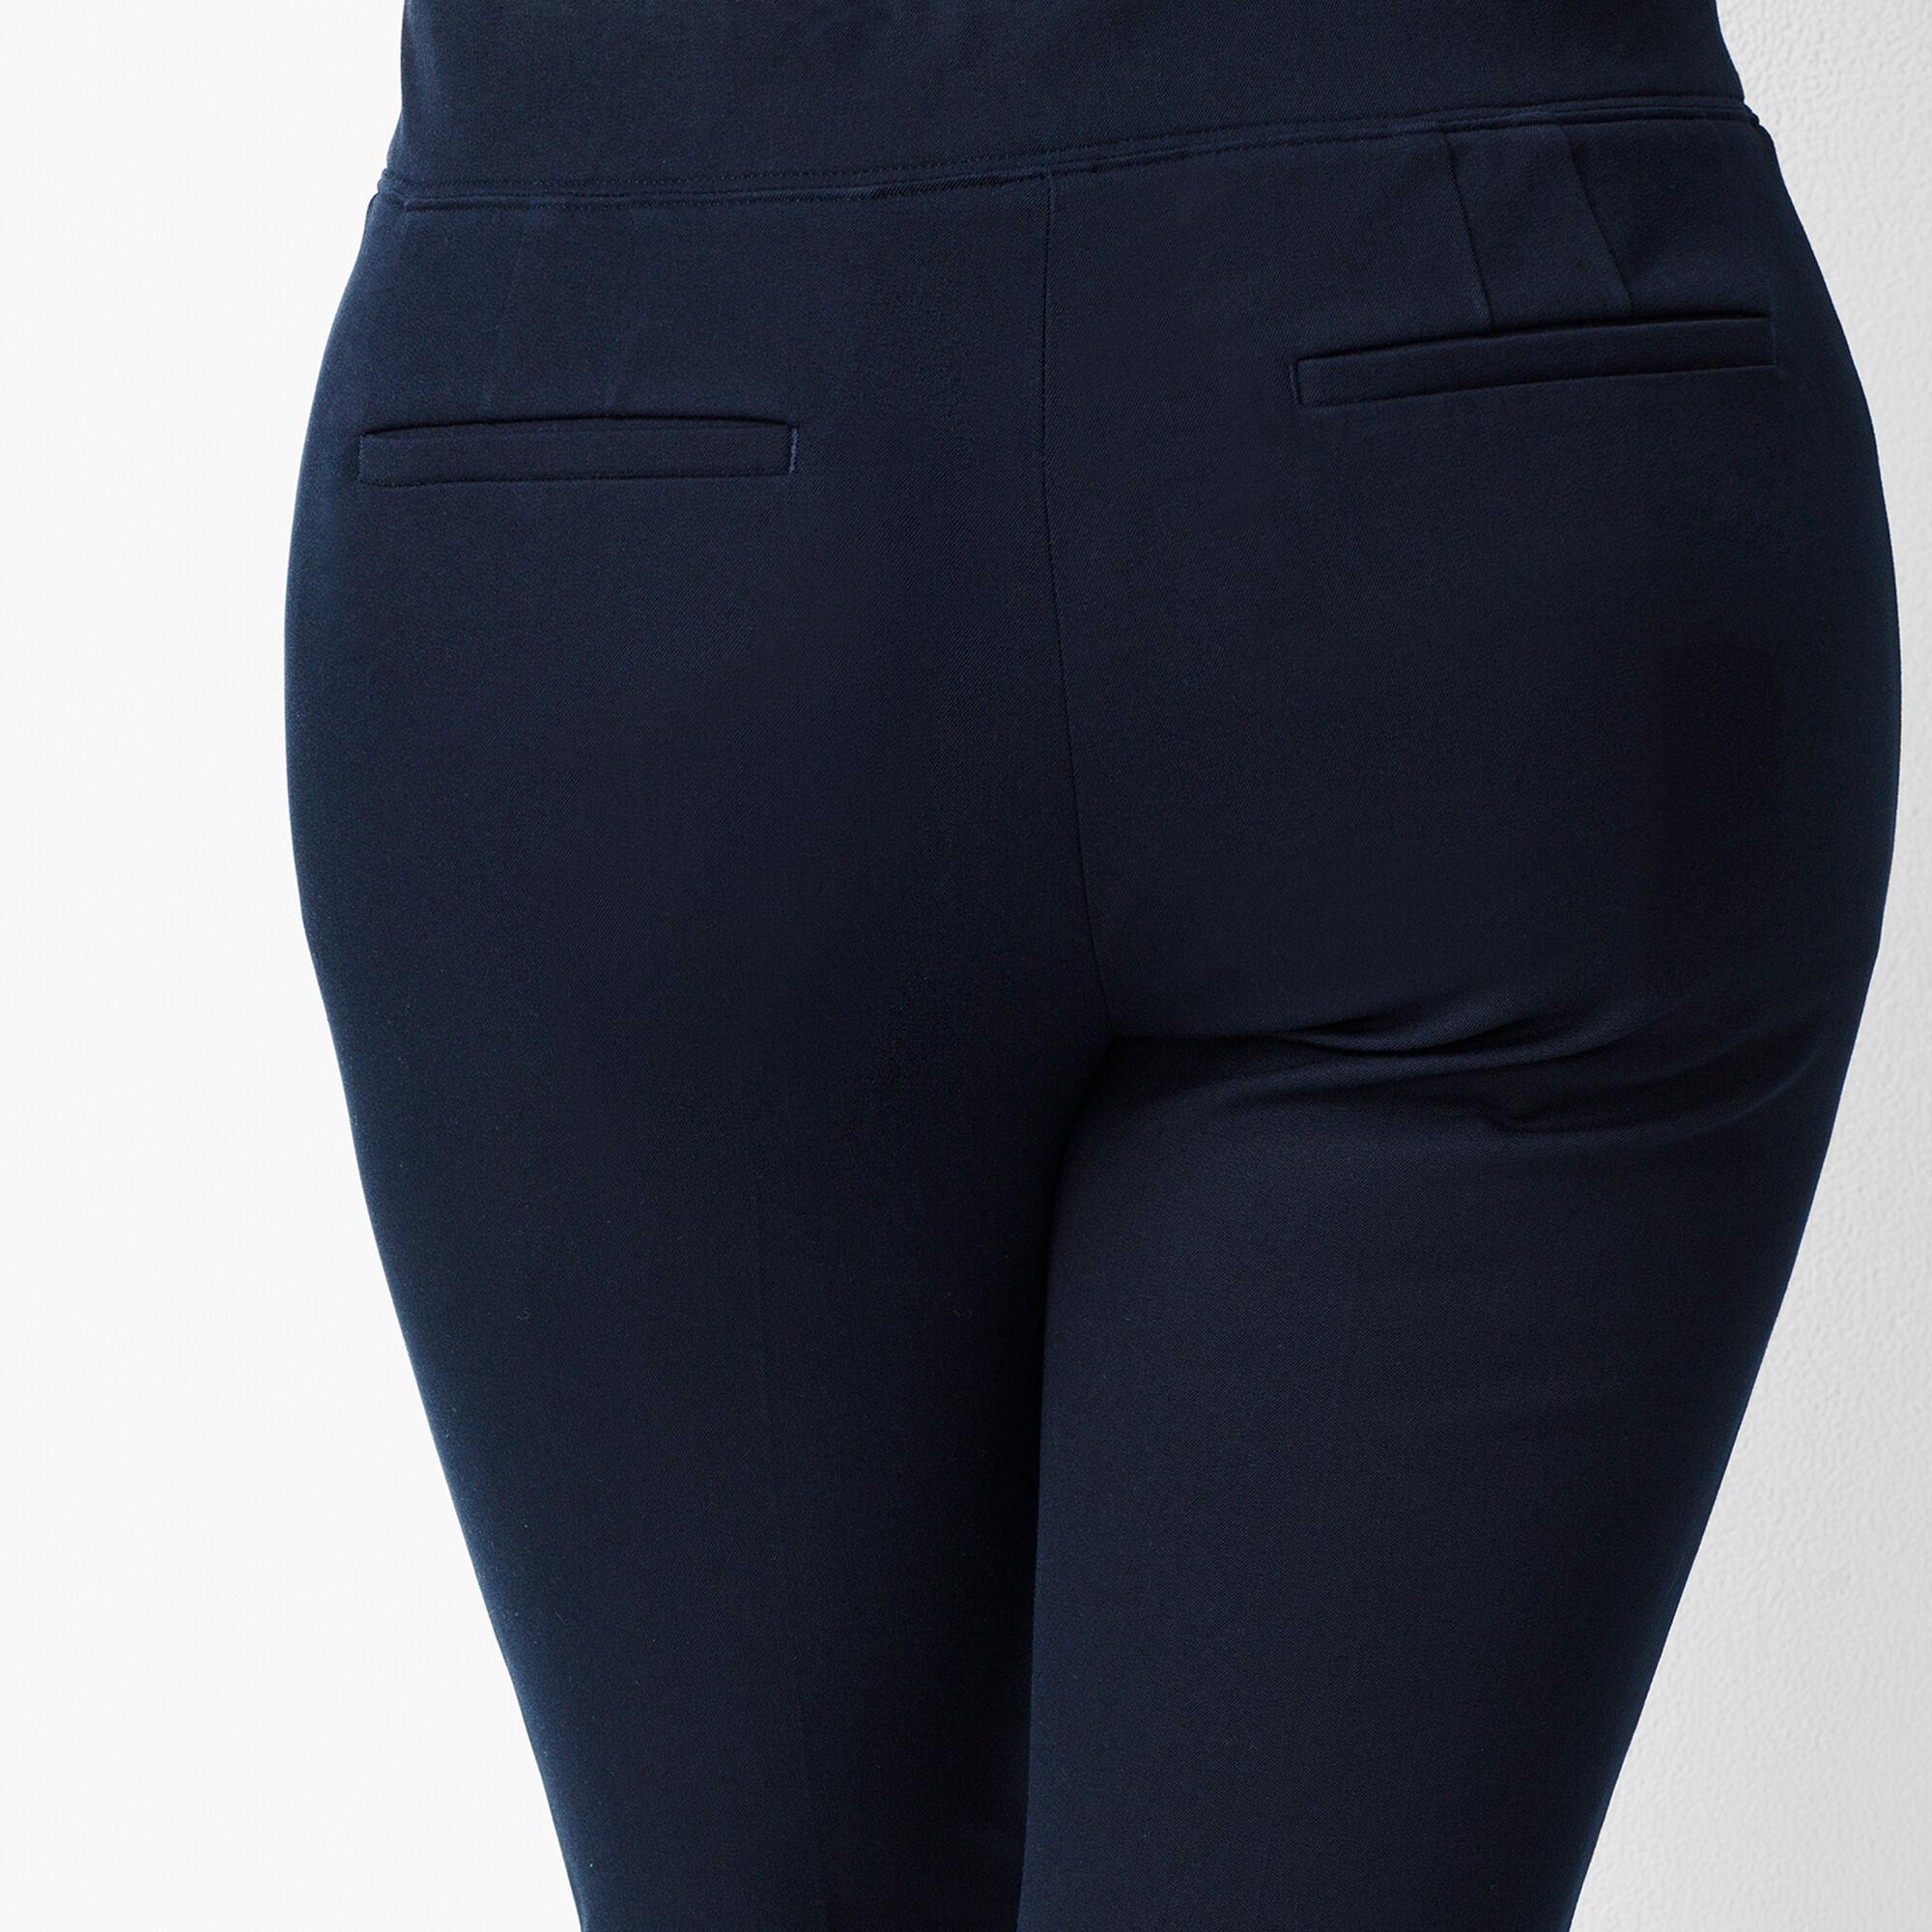 b0b47dbfd94 Bi-Stretch Pull-On Ankle Pants Opens a New Window.